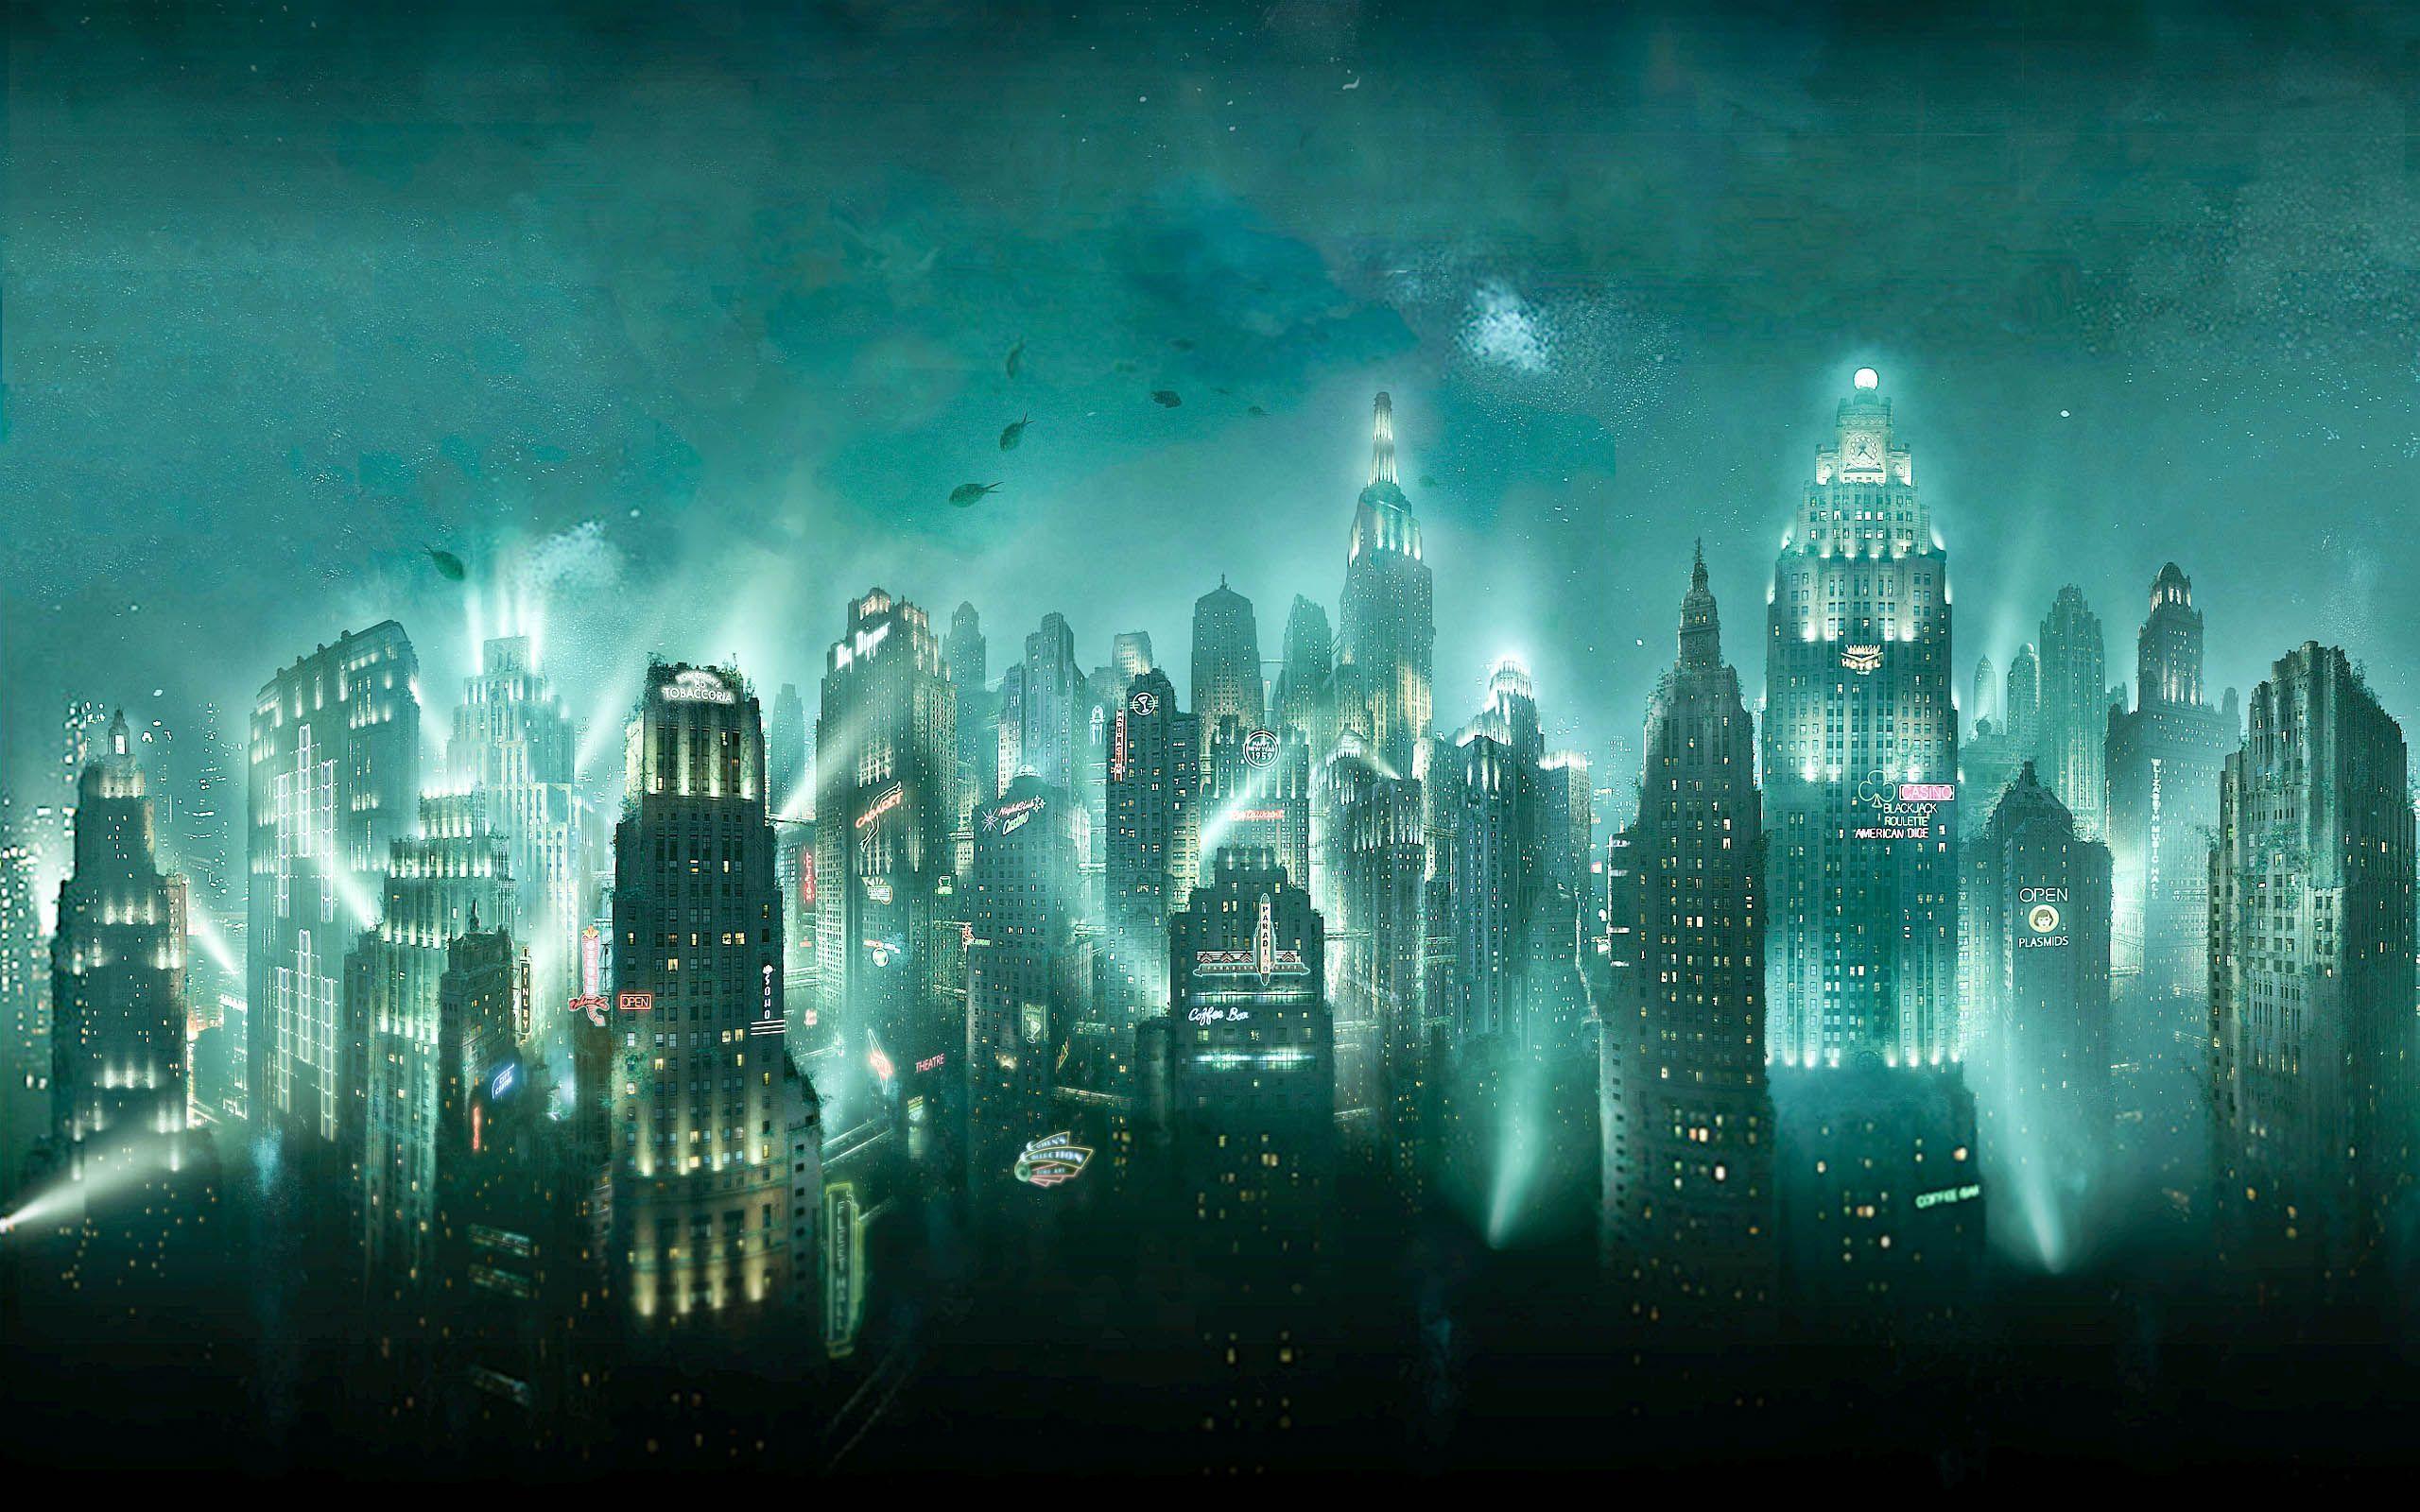 BioShock 4K Wallpapers - Top Free